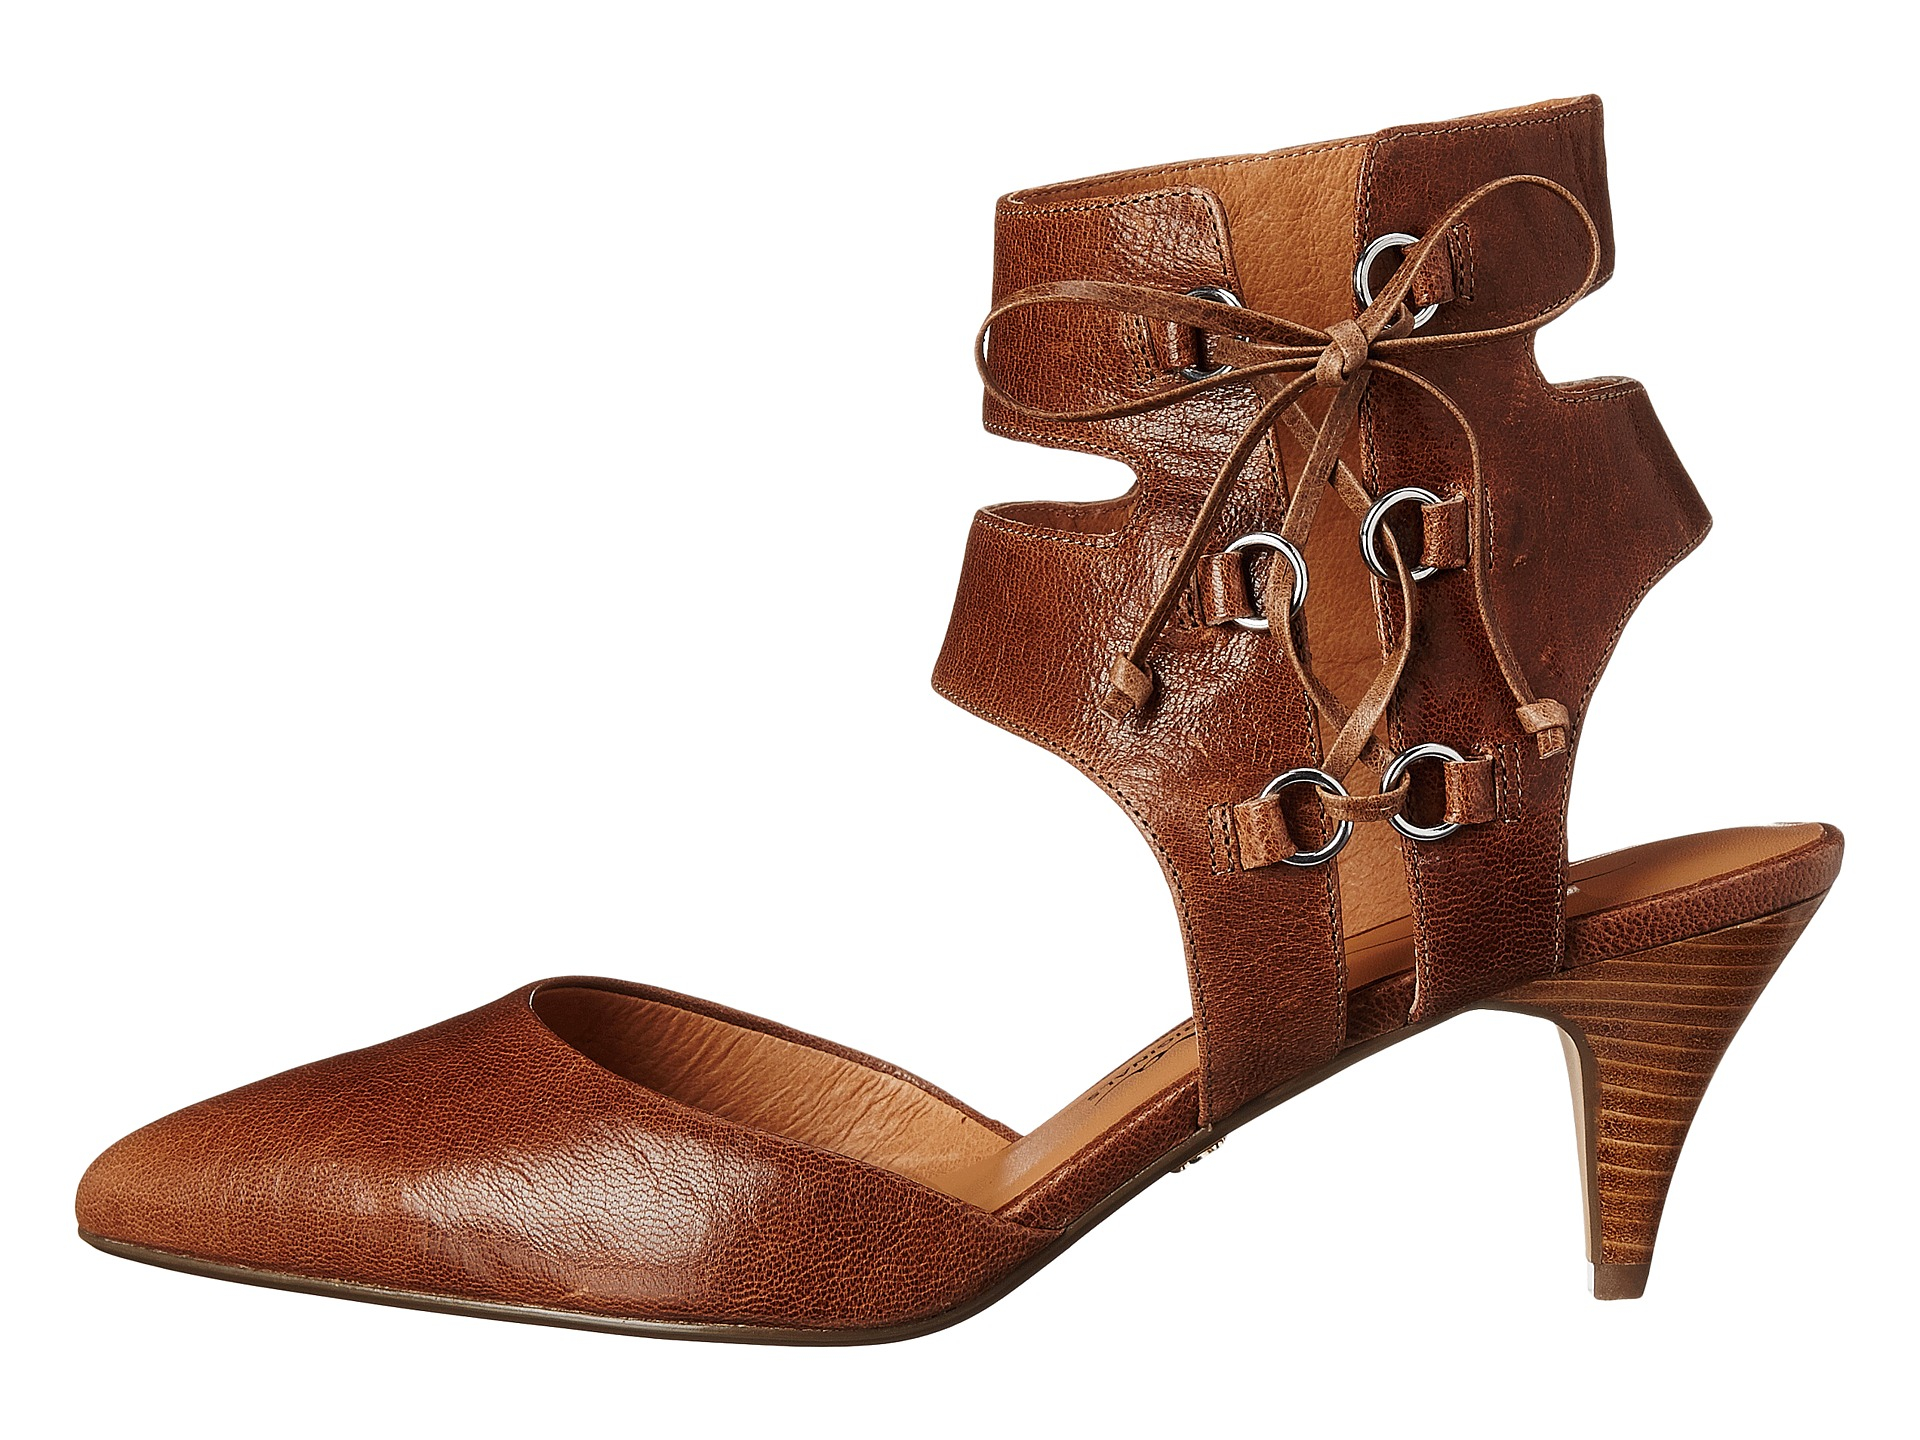 Nina Originals Francesa Ankle-Cuff Pump (Women's) PHe4oNUf28